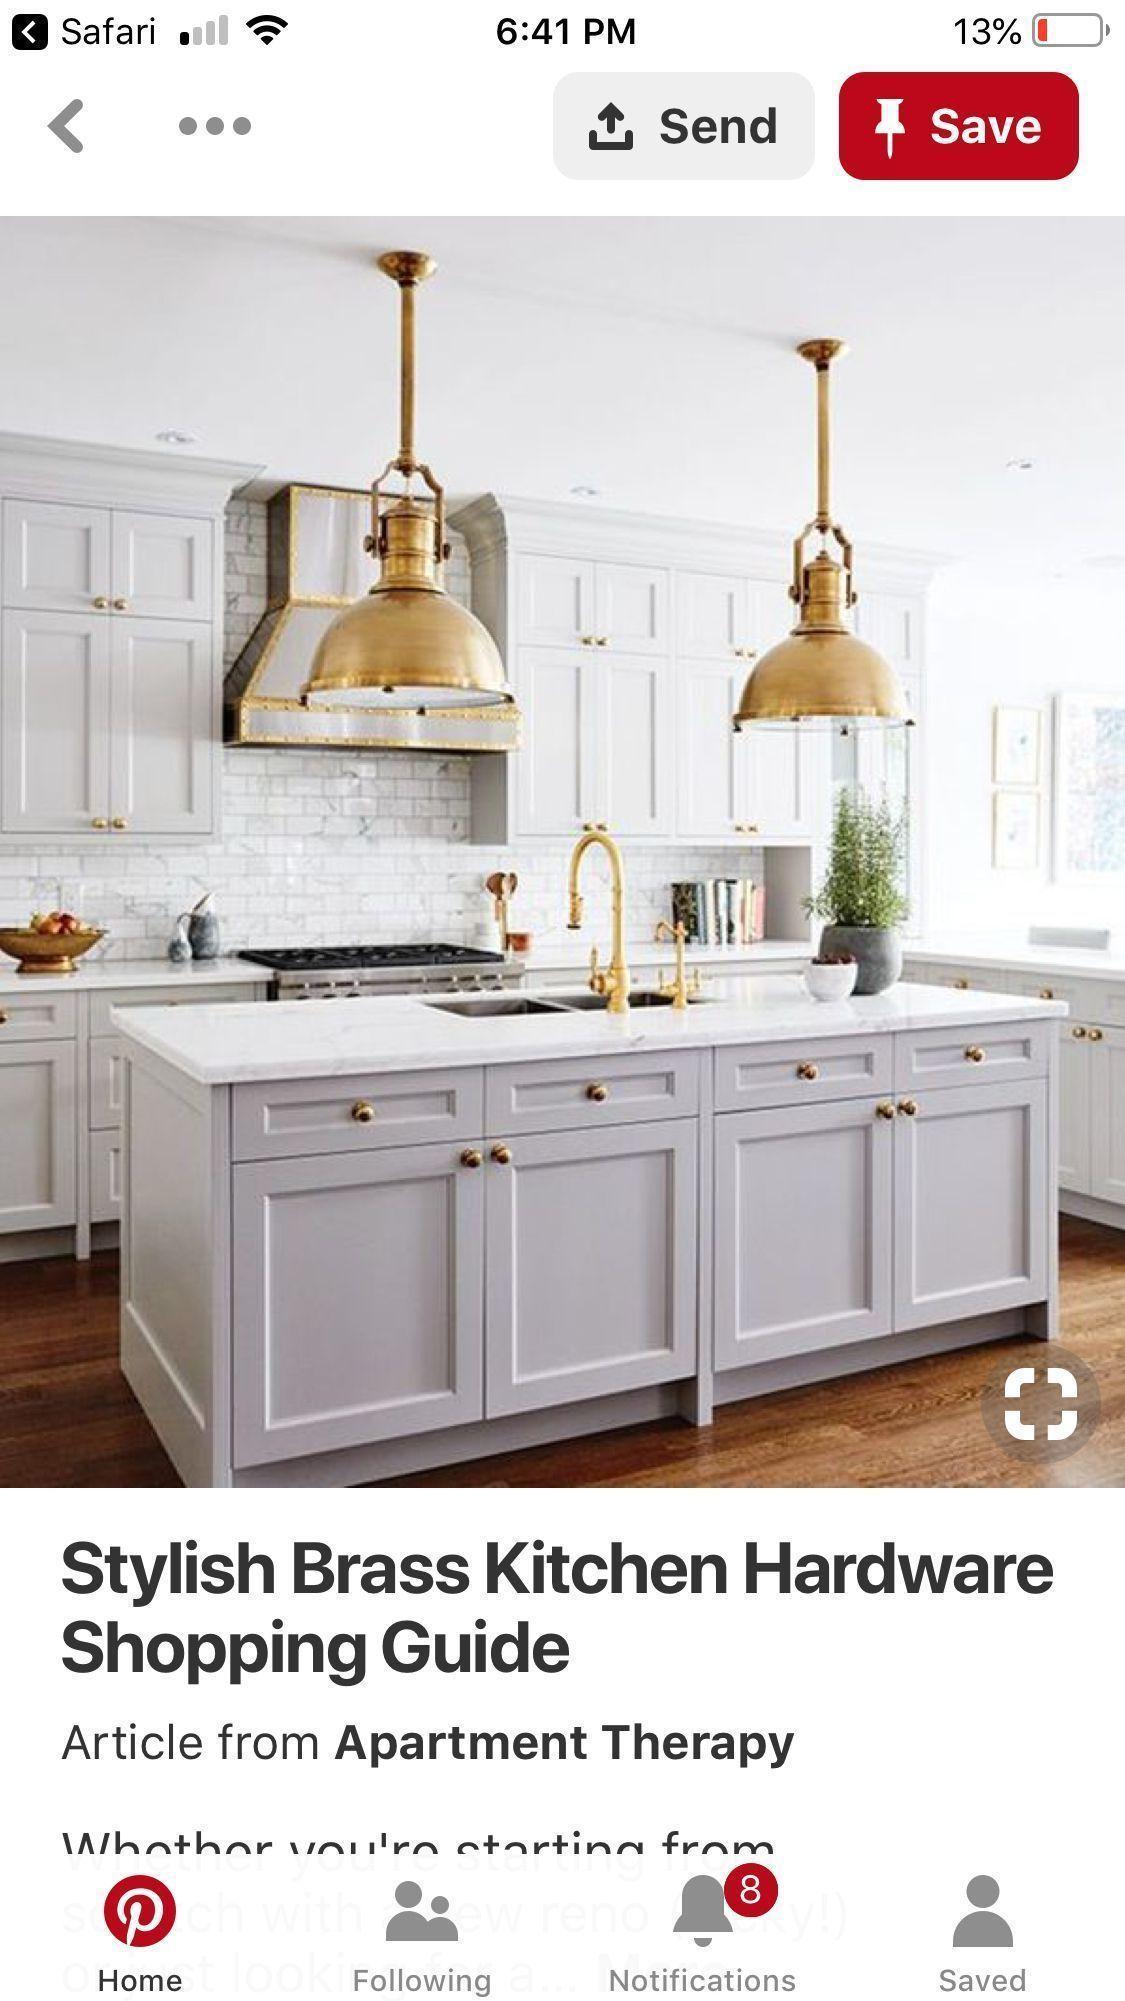 Kitchen Remodel Kitchen Remodel Kitchen Remodel Kitchen Remodel Kitchen Remodel Kitchen Remodel Kitchen Remodel Kitchen Remodel Kitchen Remodel Kitchen Remodel Kitchen Re...